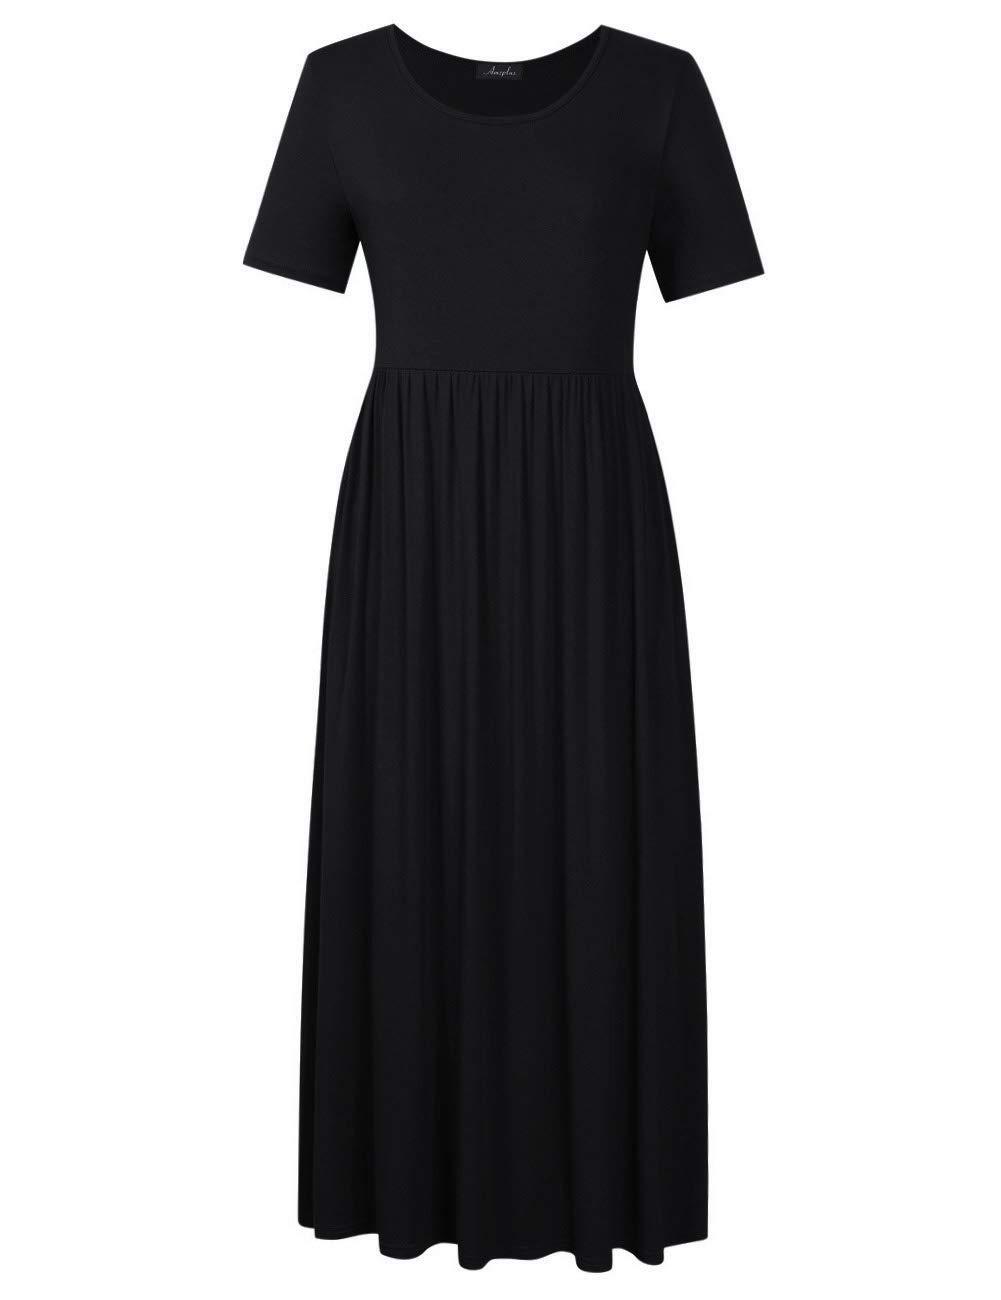 AMZ PLUS Women Short Sleeve Floral Bohemian Plus Size Beach Maxi Dress Black 4XL